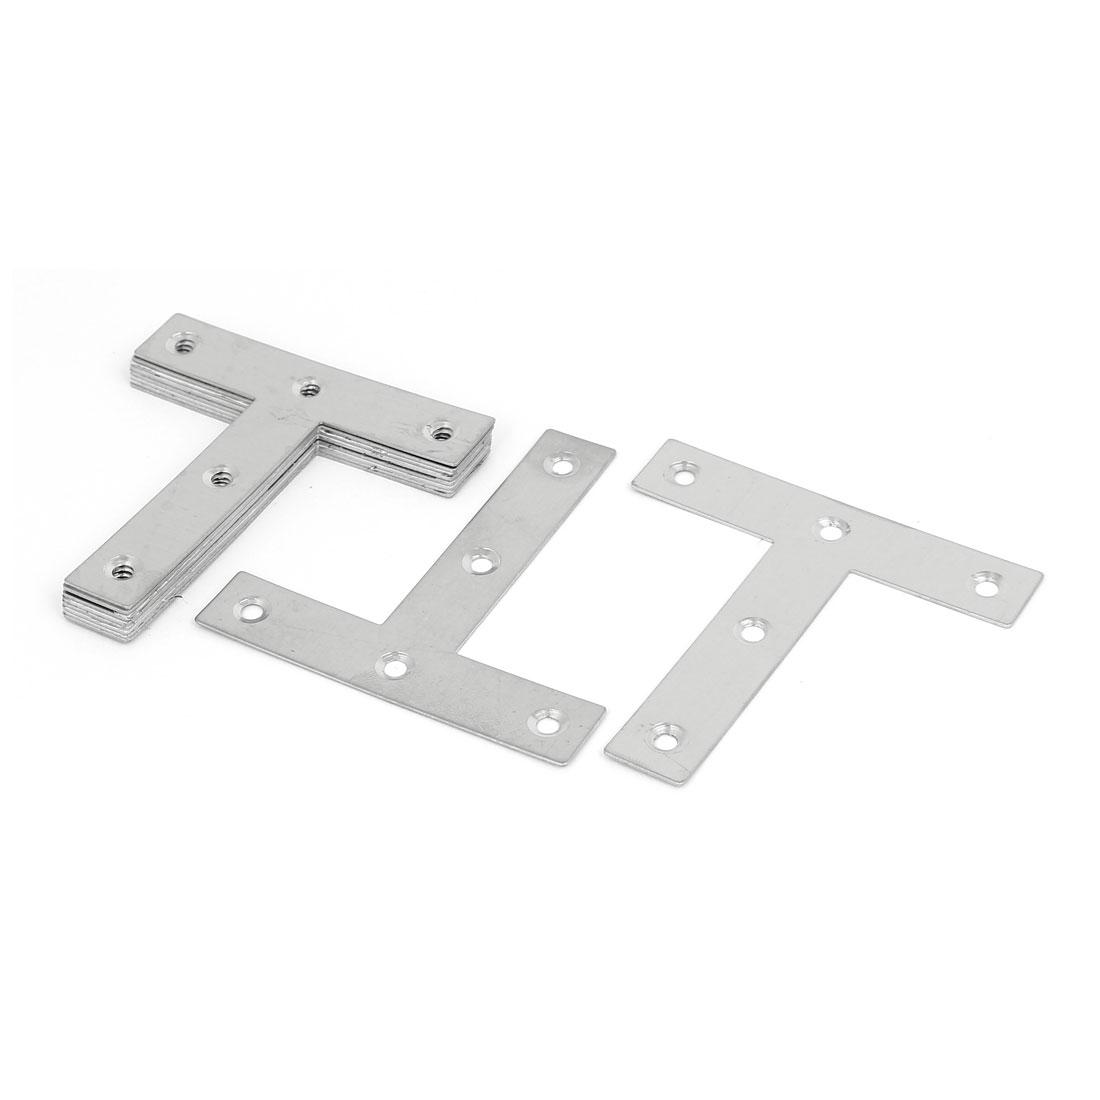 80mmx80mm T Shape Flat Fixing Plate Corner Brace Angle Bracket Silver Tone 10pcs